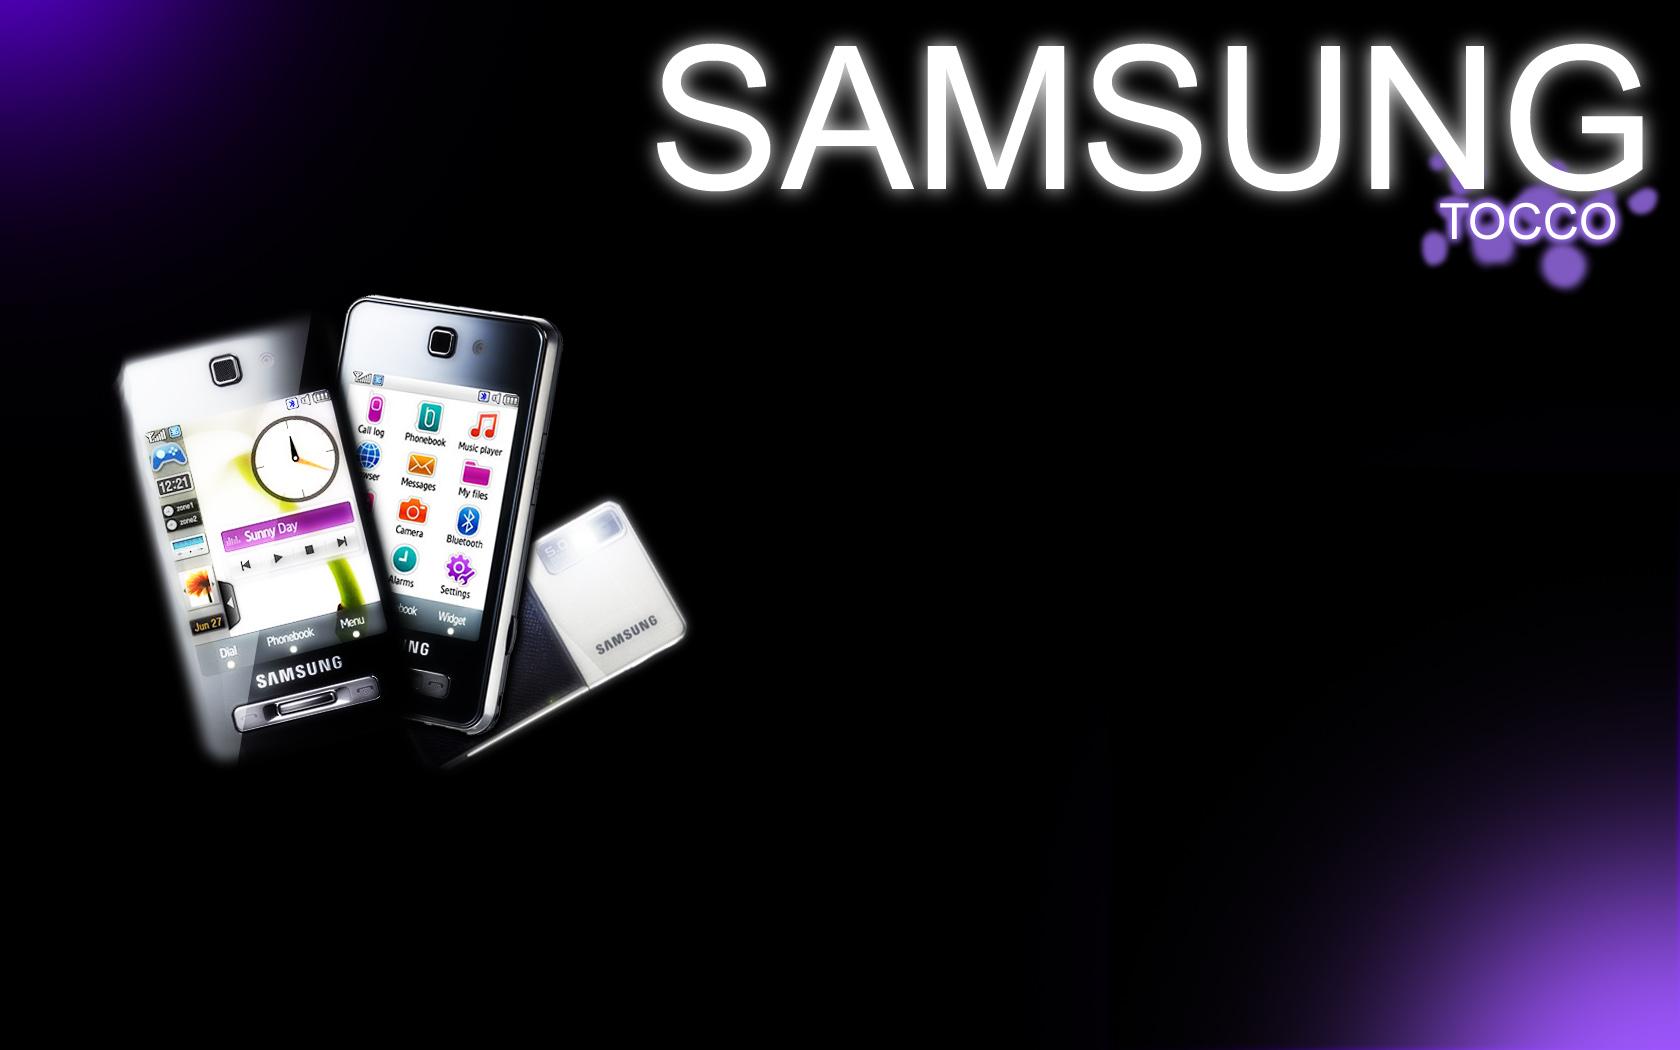 Download New Mp3 Wallpaper Samsung Logo Samsung 1680x1050 Download Hd Wallpaper Wallpapertip